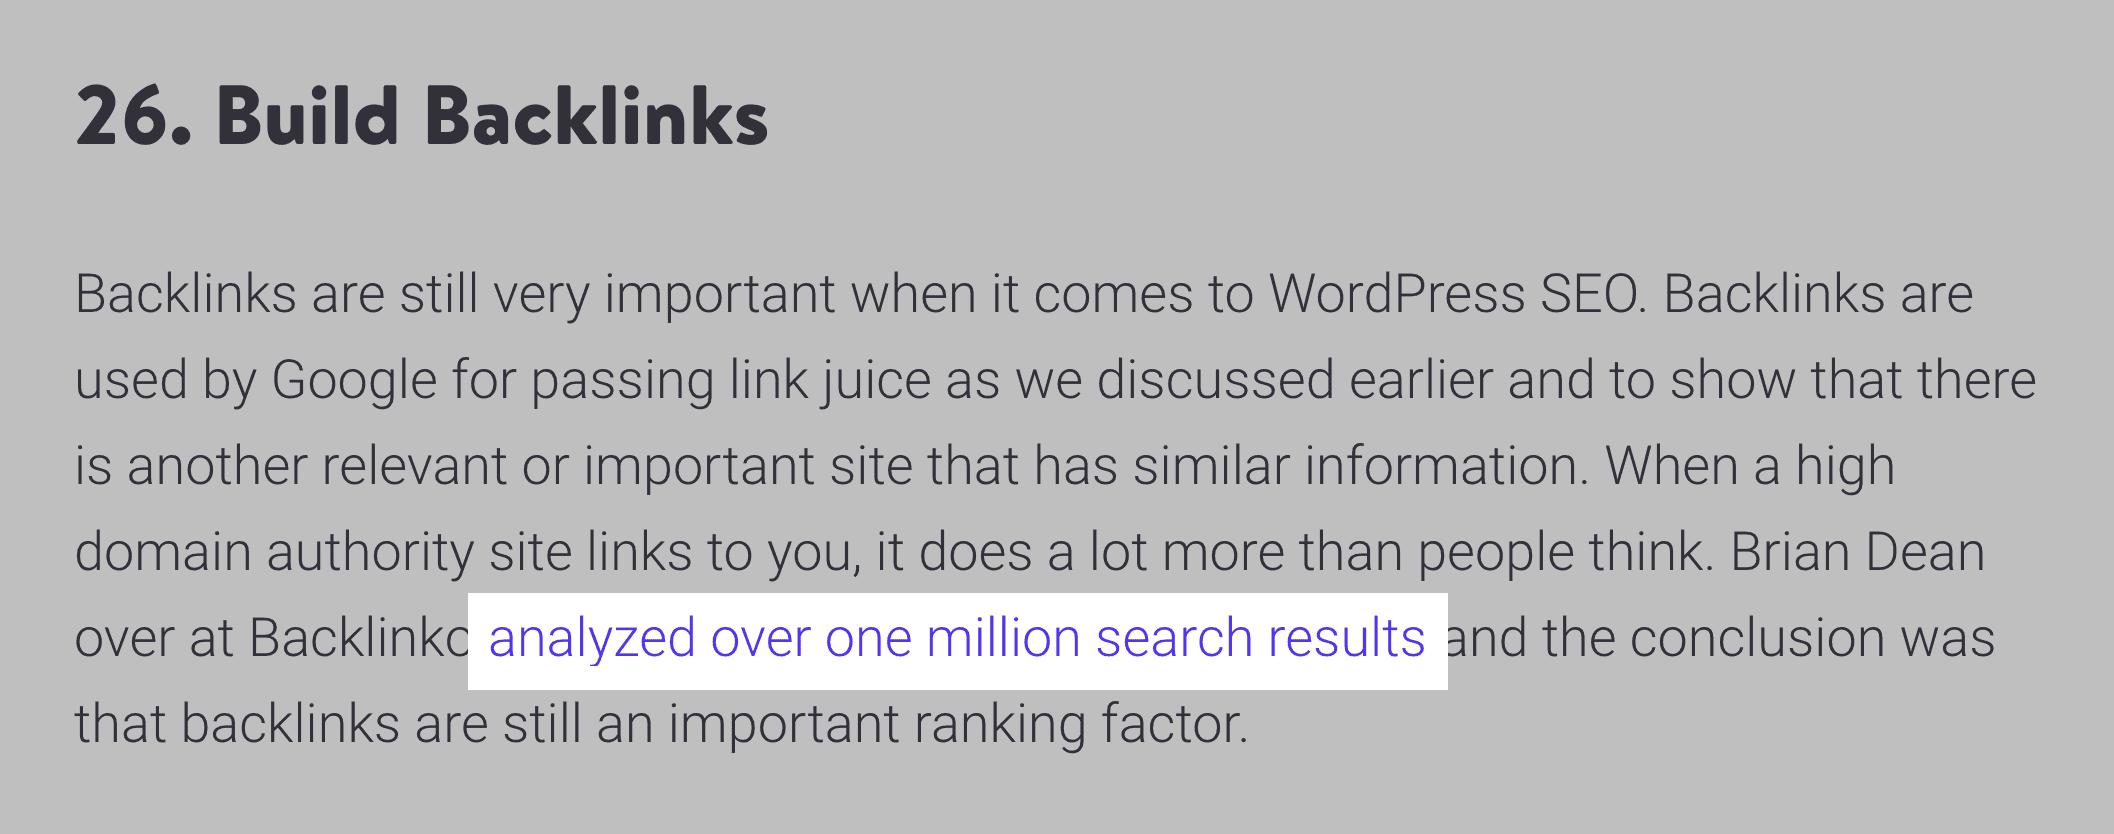 Ahrefs – Backlinks to Google Ranking Factors study